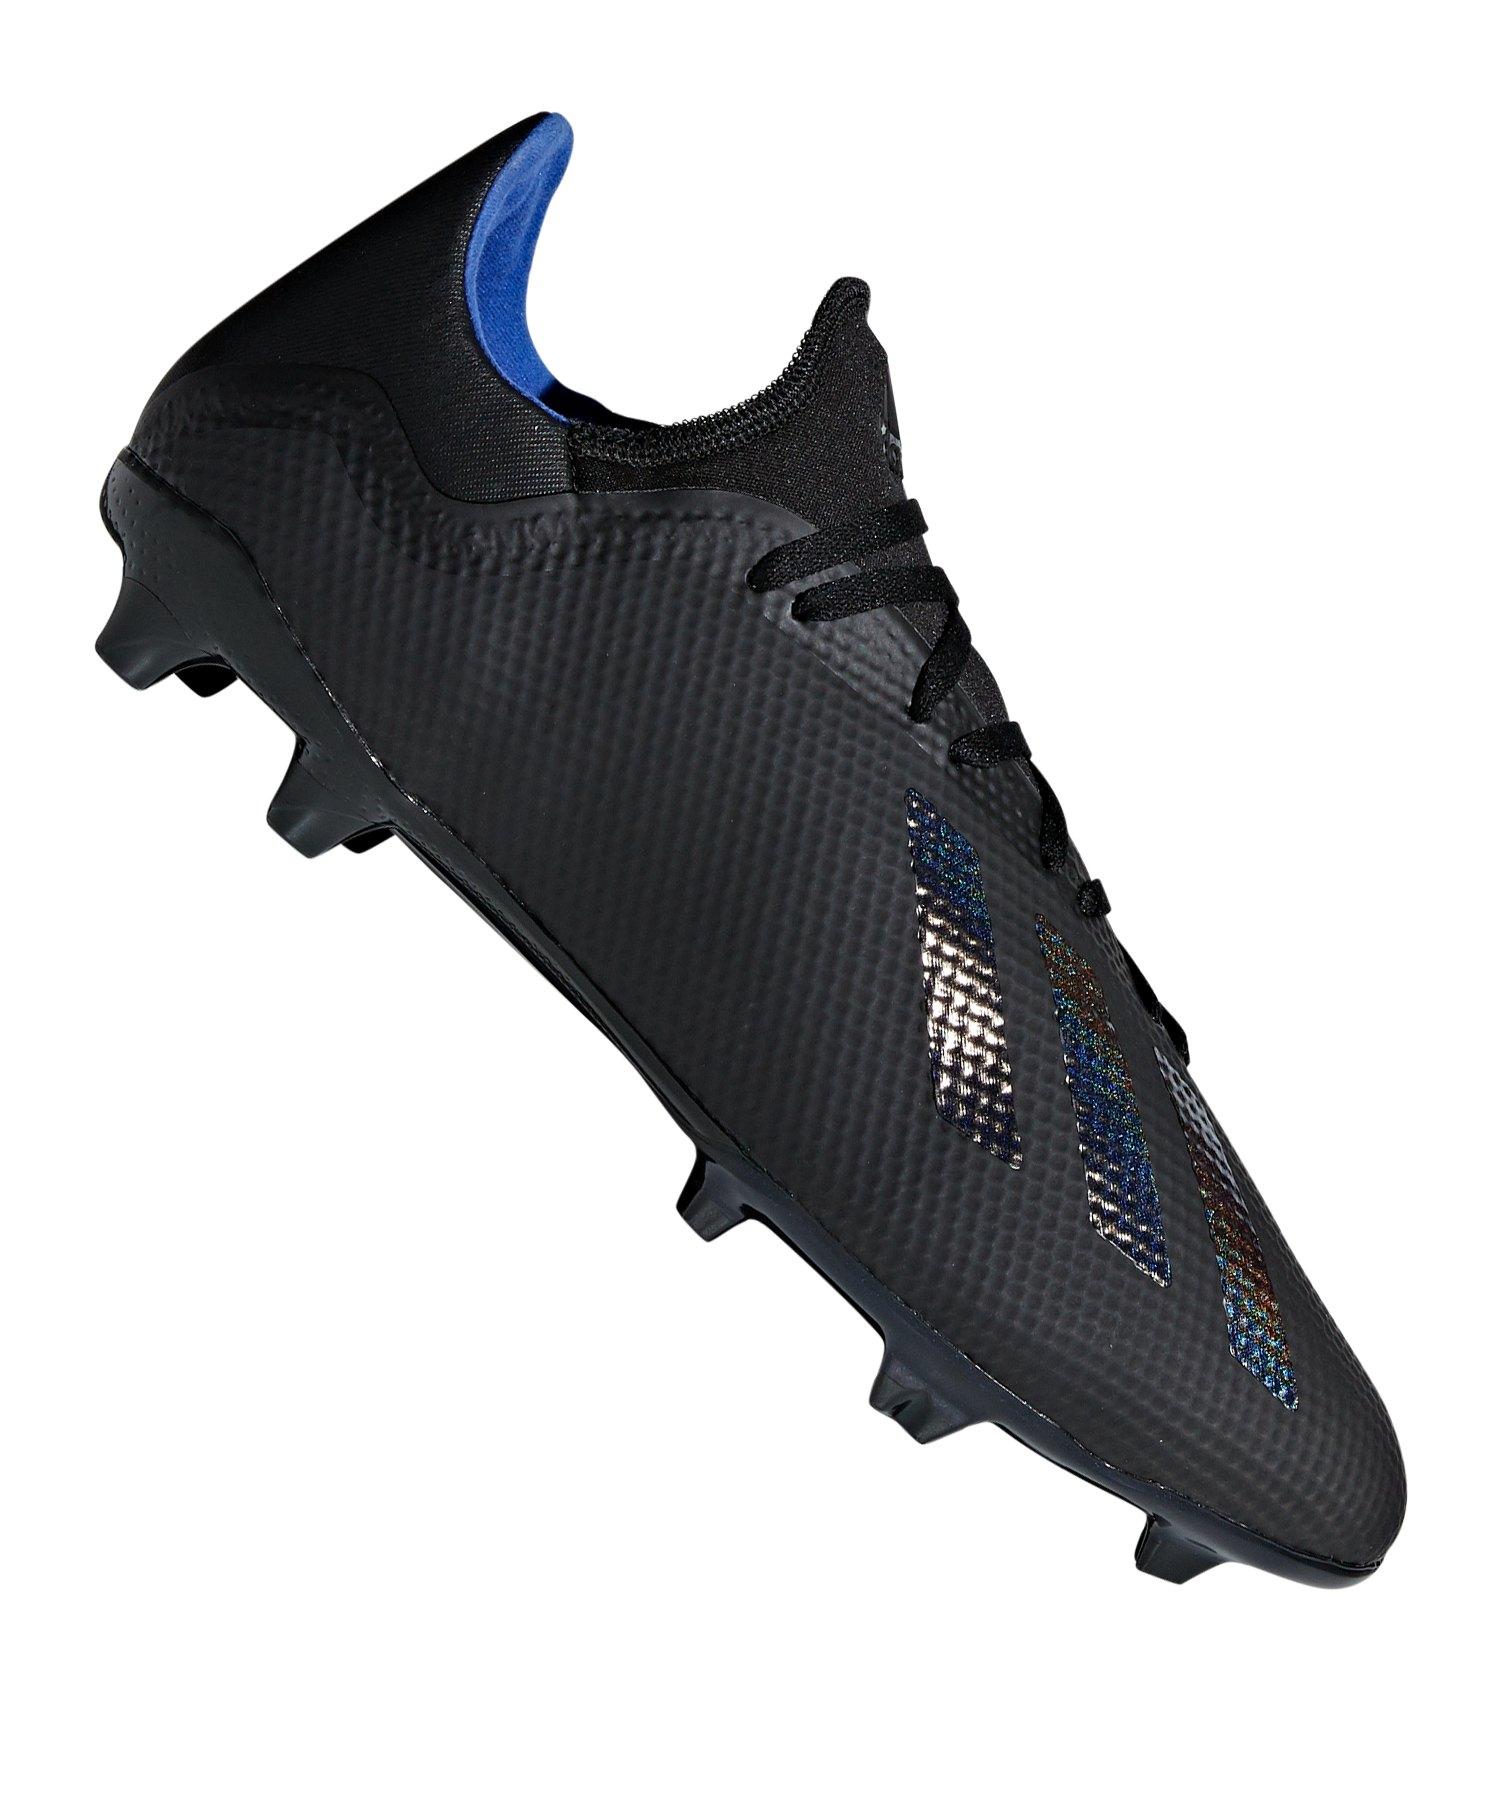 adidas X 18.3 FG Schwarz - schwarz